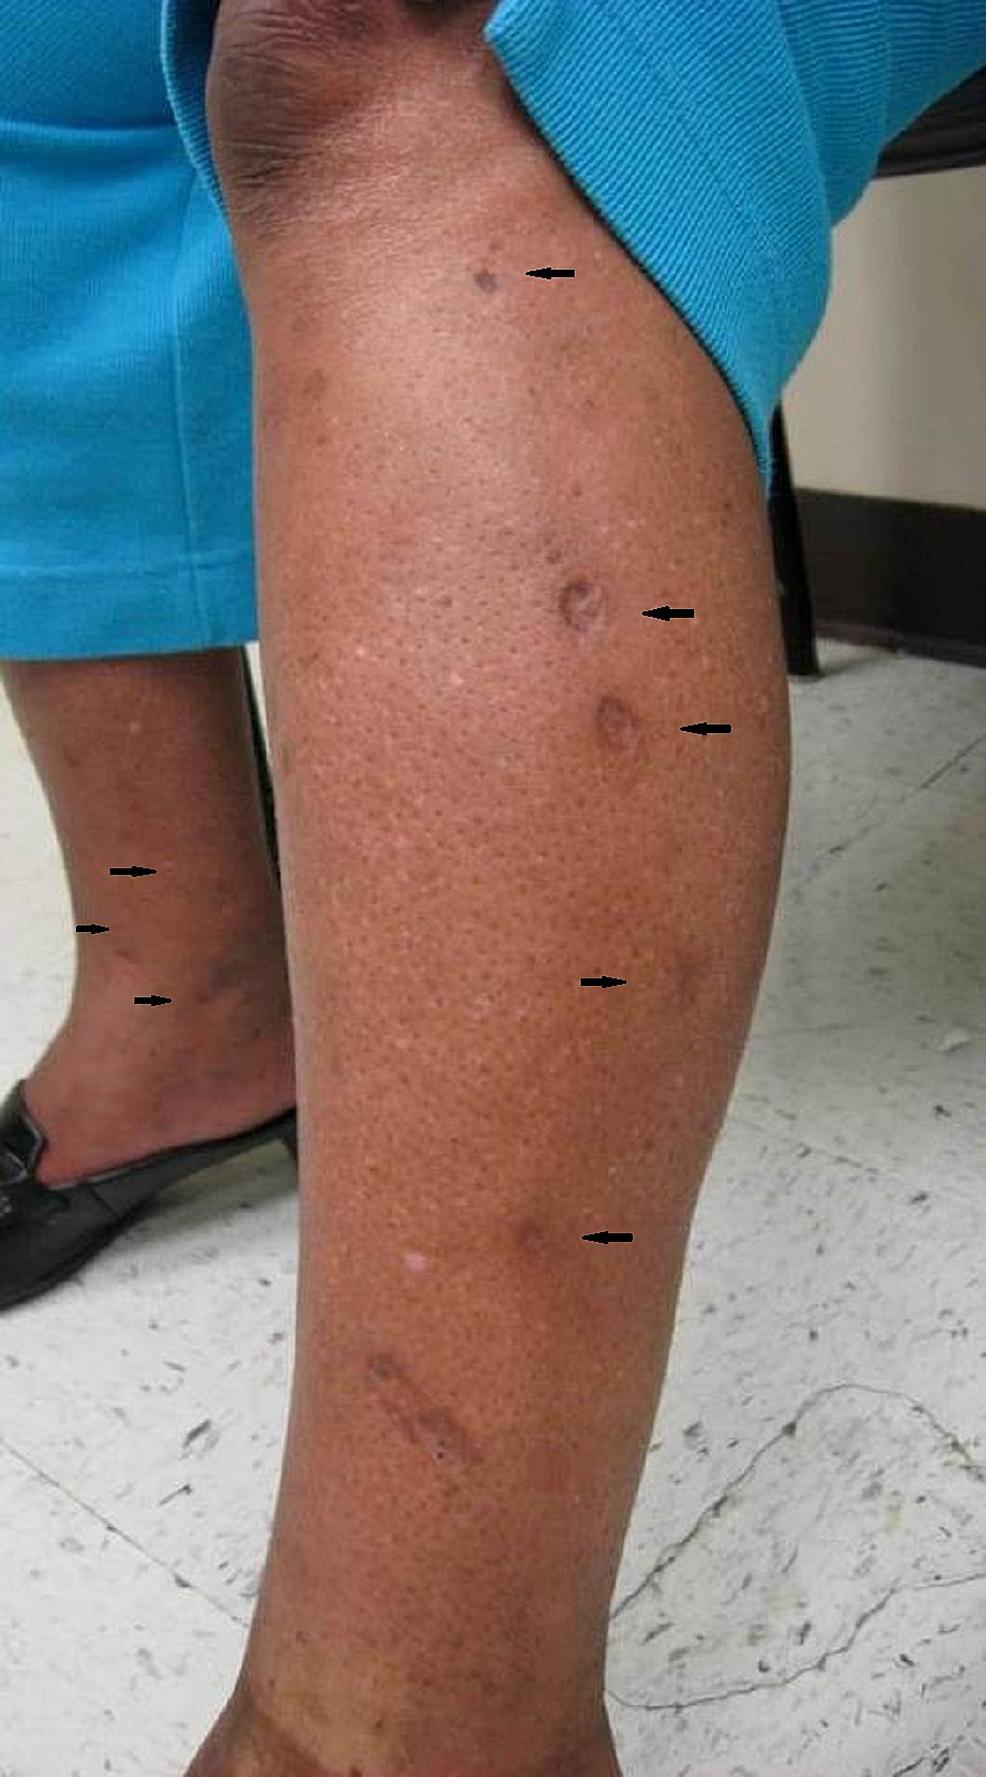 Left-lower-leg-with-fibrotic,-depressed,-round-papules-(black-arrows)